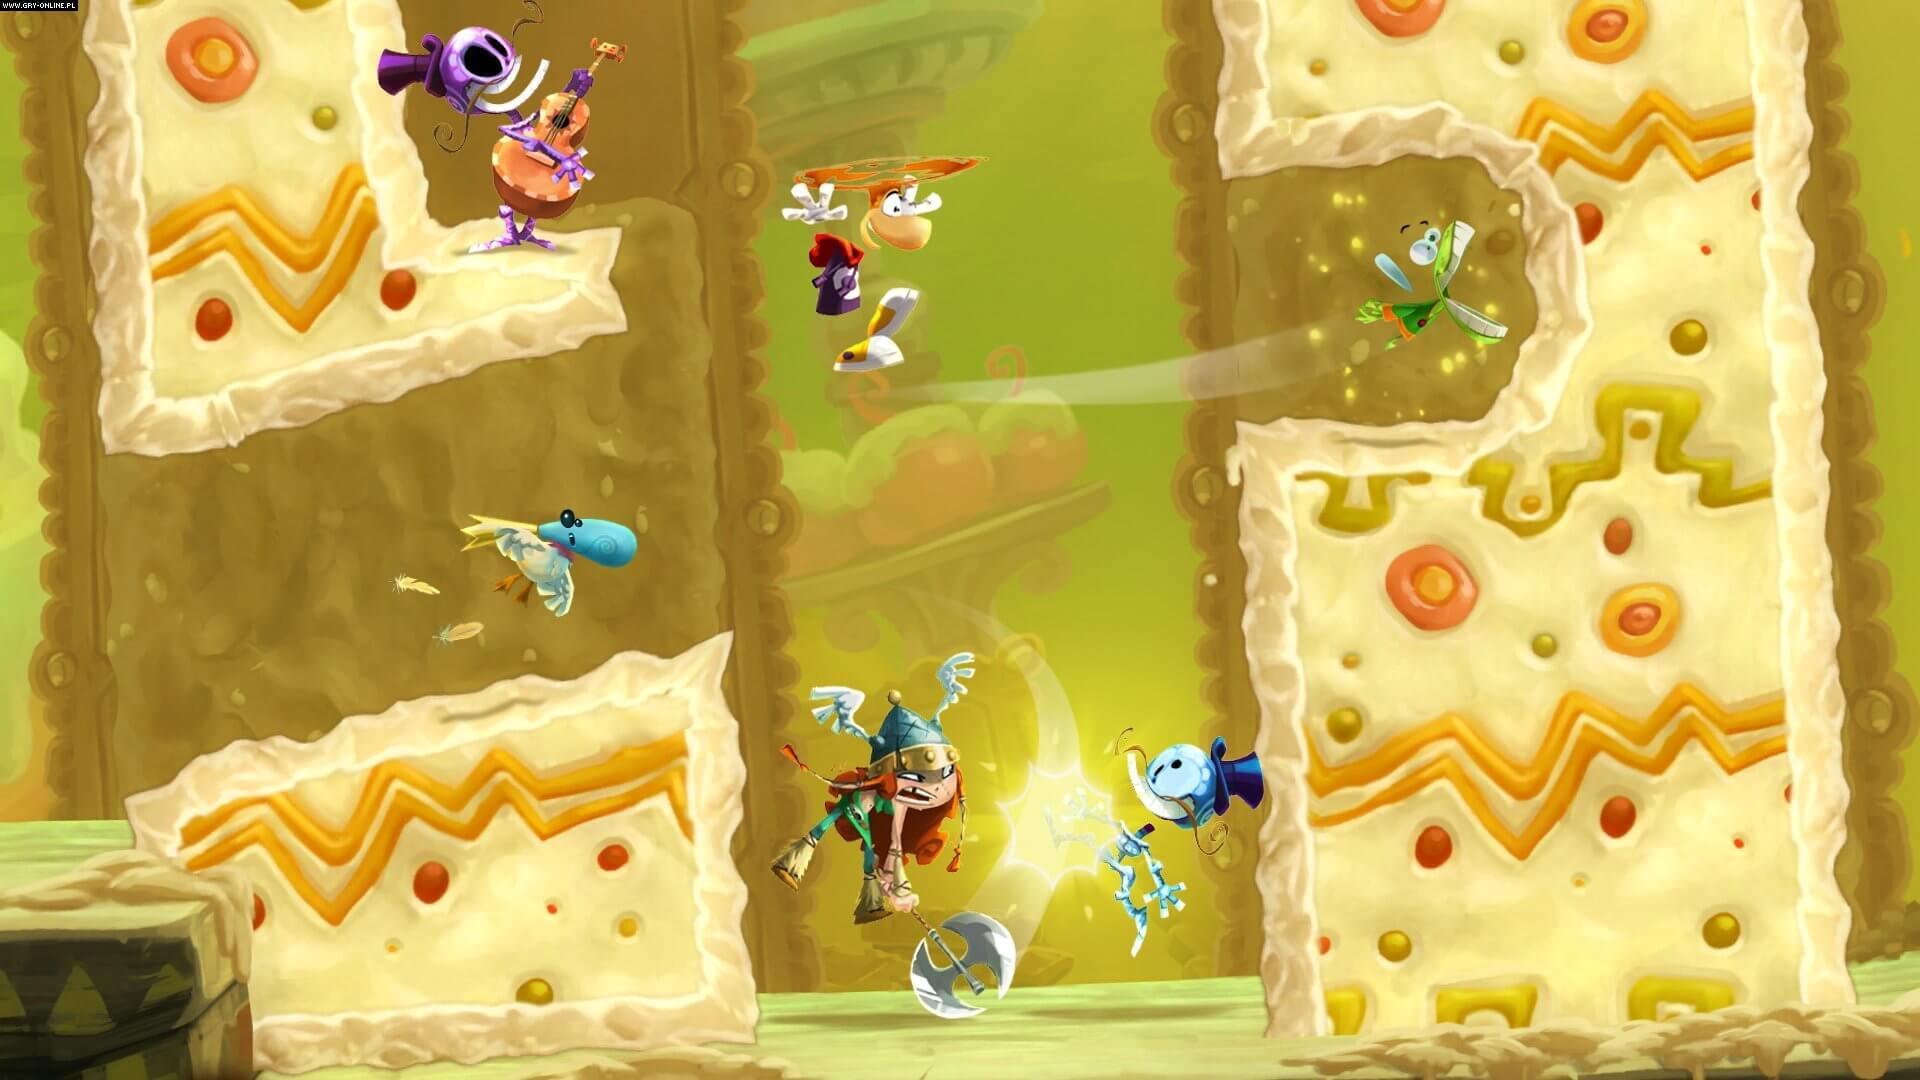 Rayman Legends Gameplay Screenshot 6